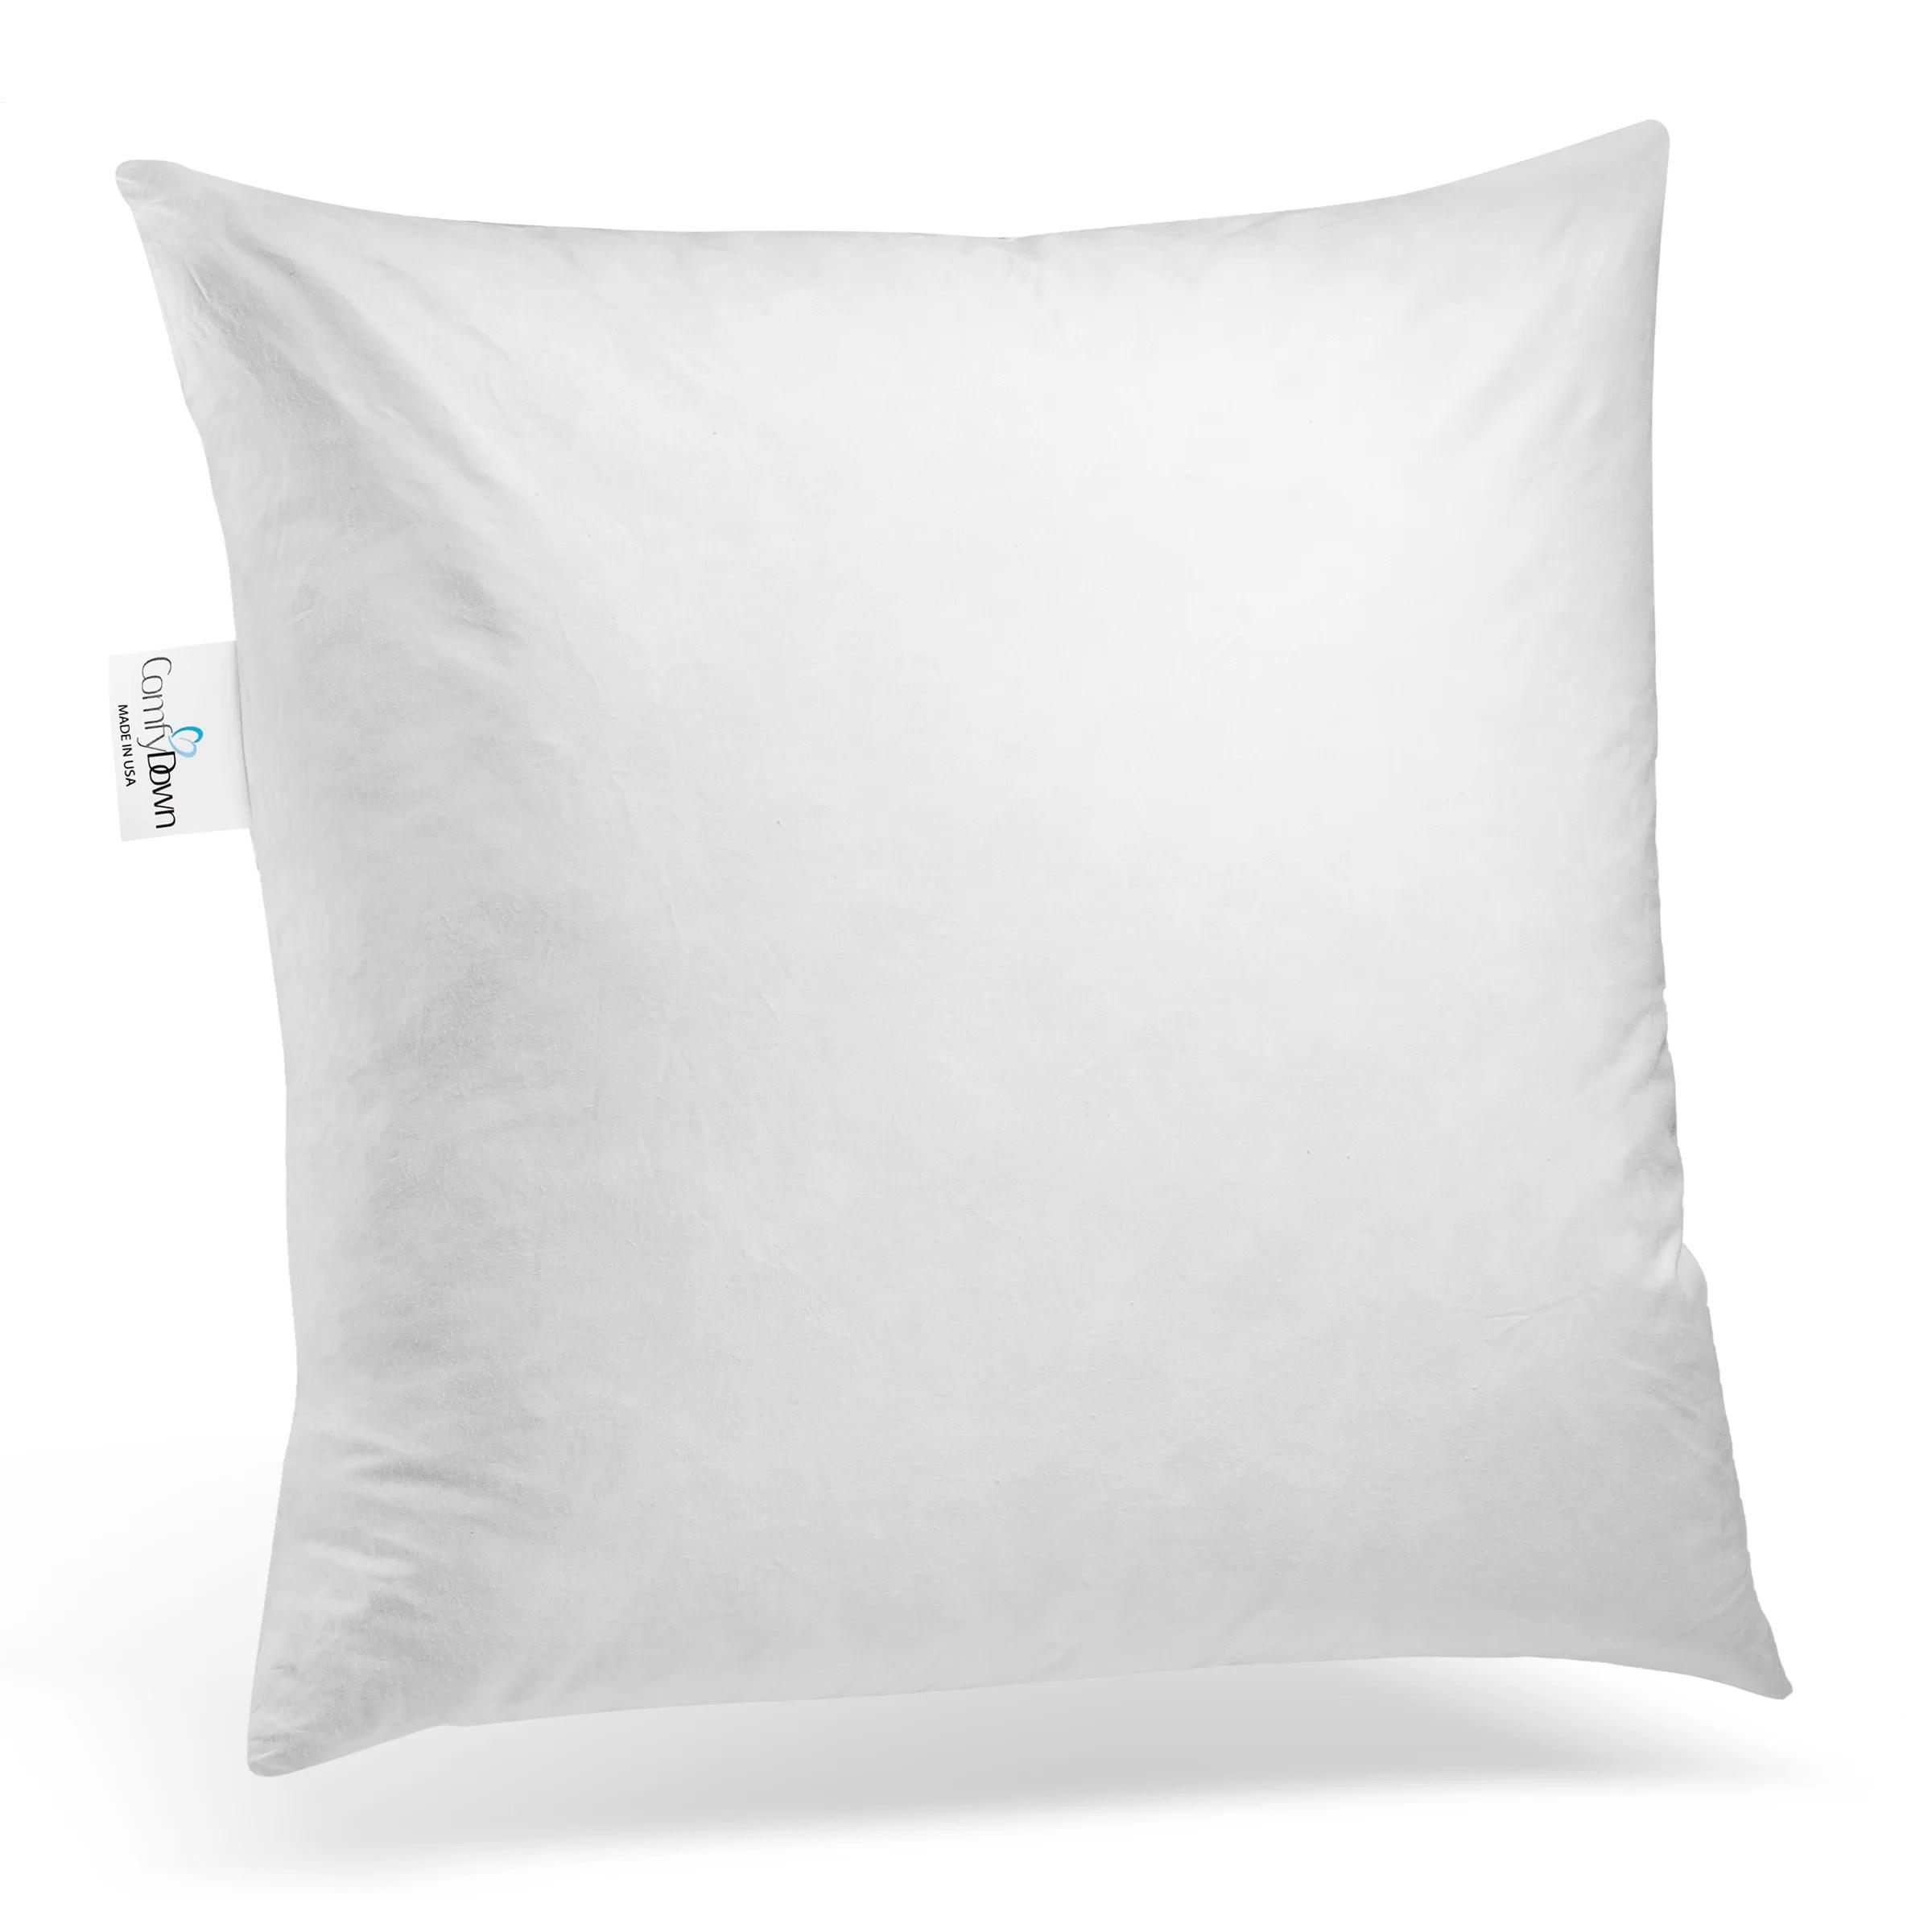 12x18 lumbar pillow insert throw